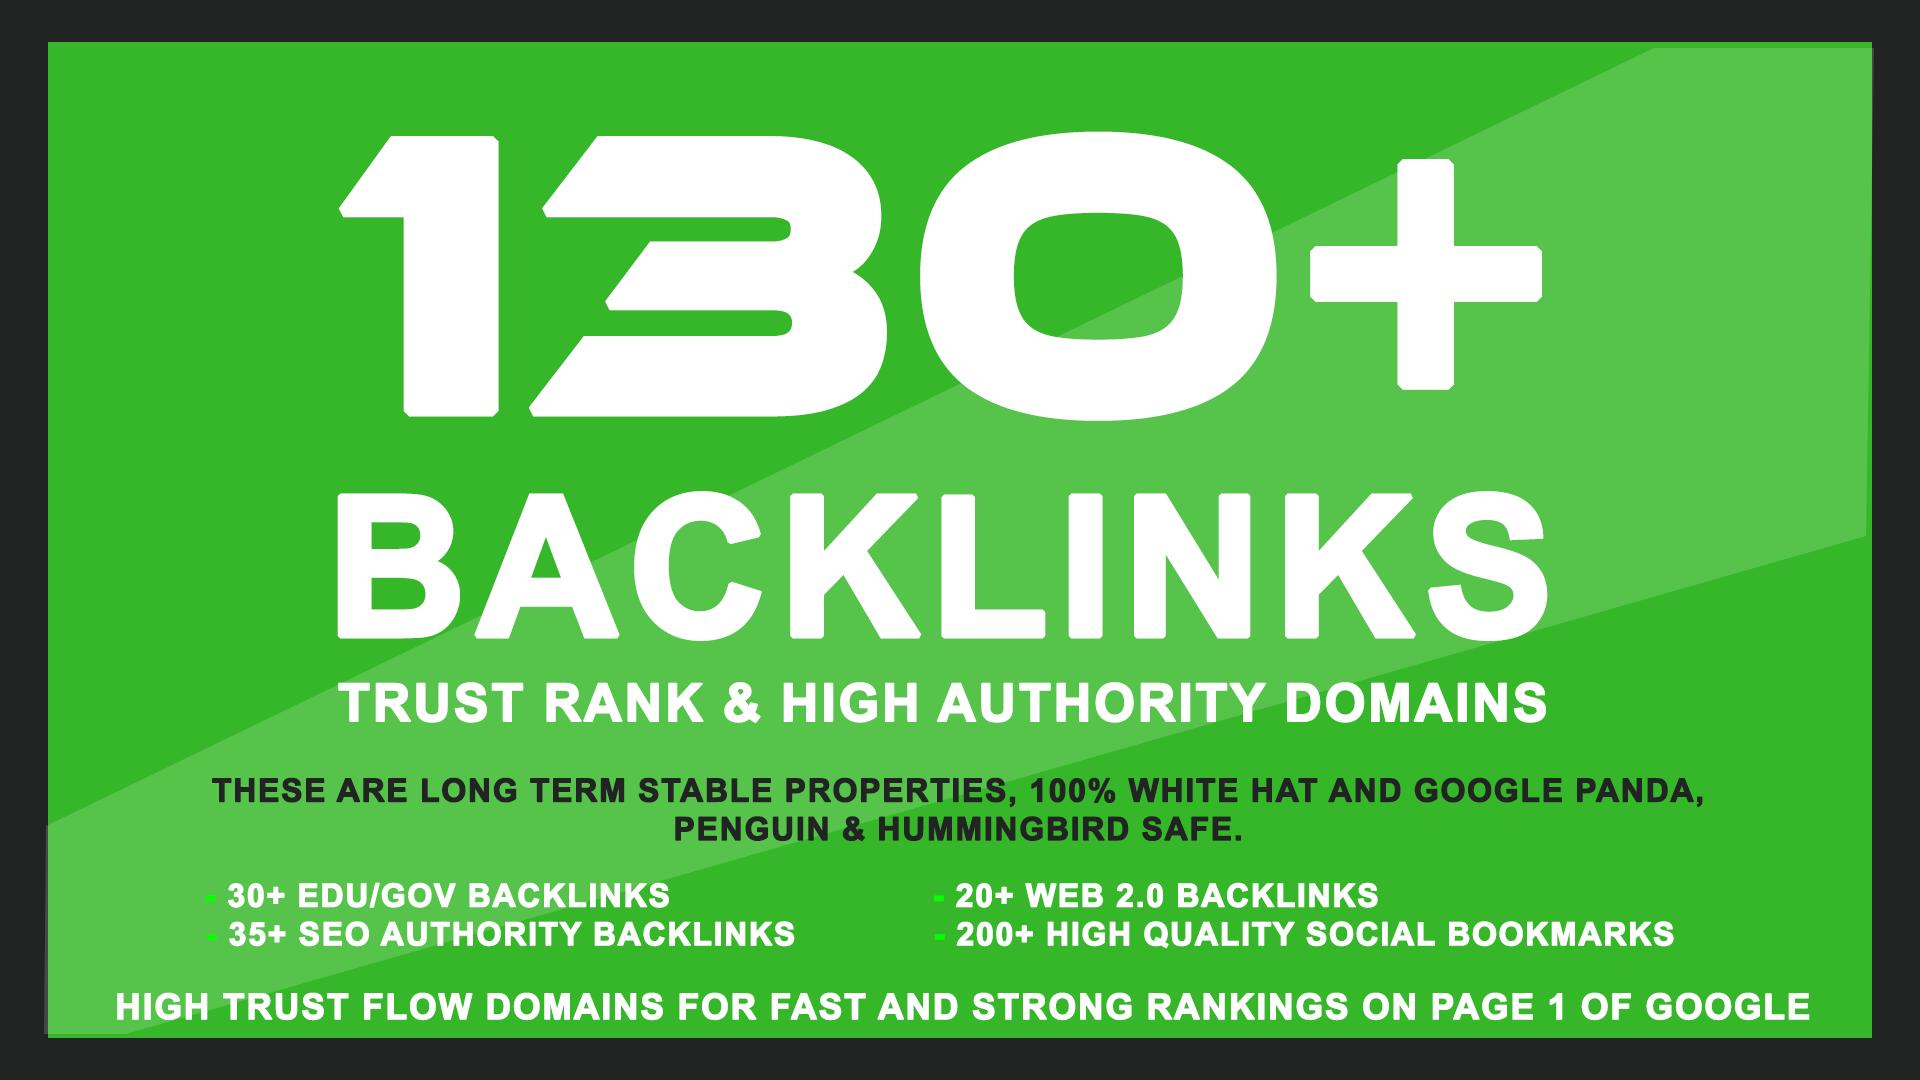 130+ High Pr SEO Authrity Backlinks to skyrocket your Google Rankings